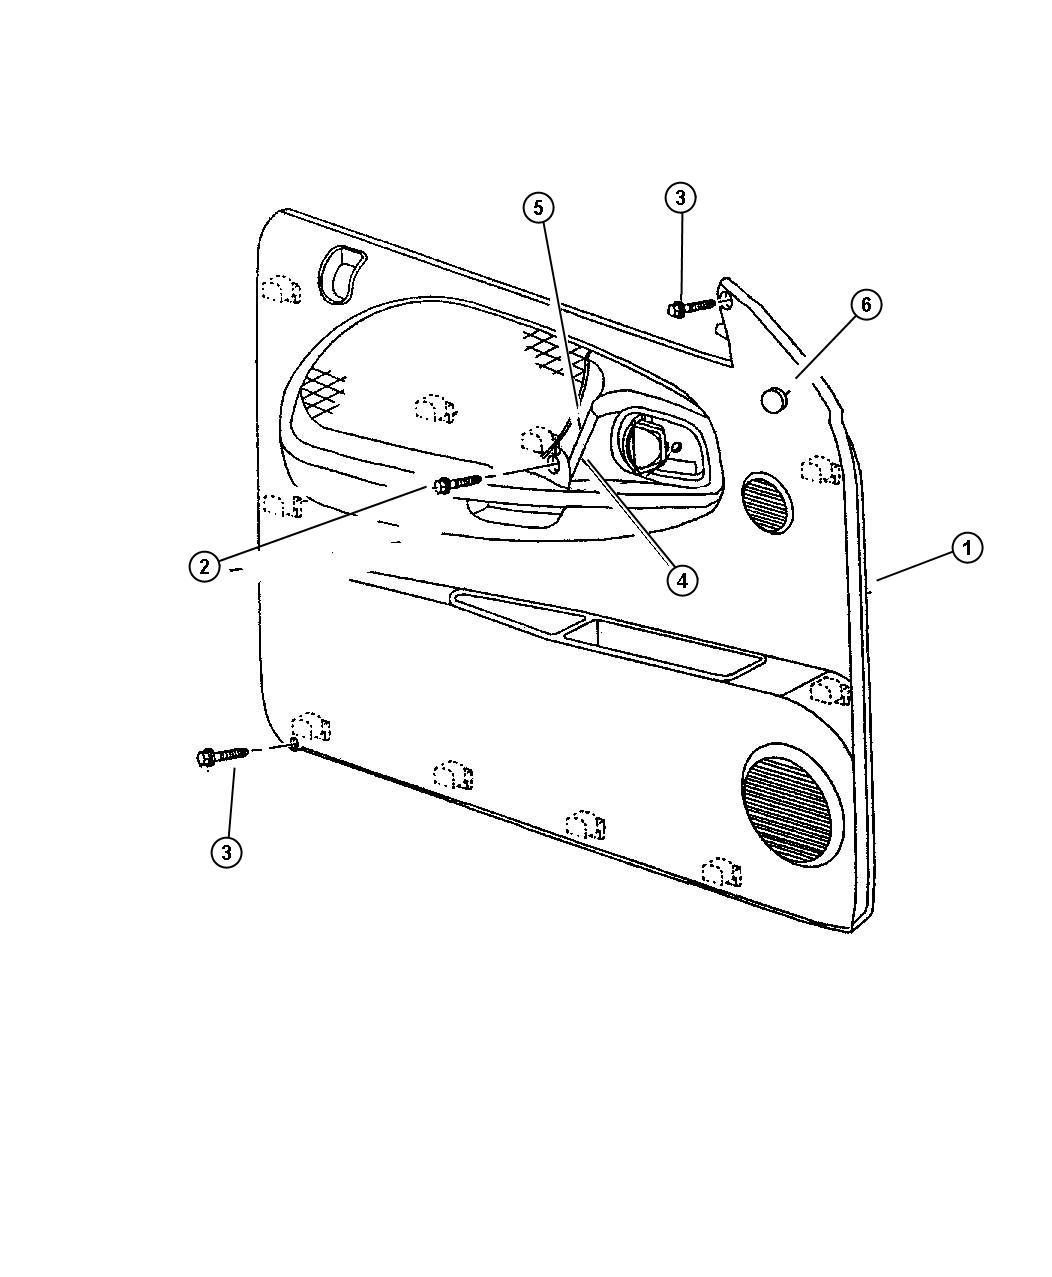 [1995 Chrysler Concorde Driver Door Latch Repair Diagram